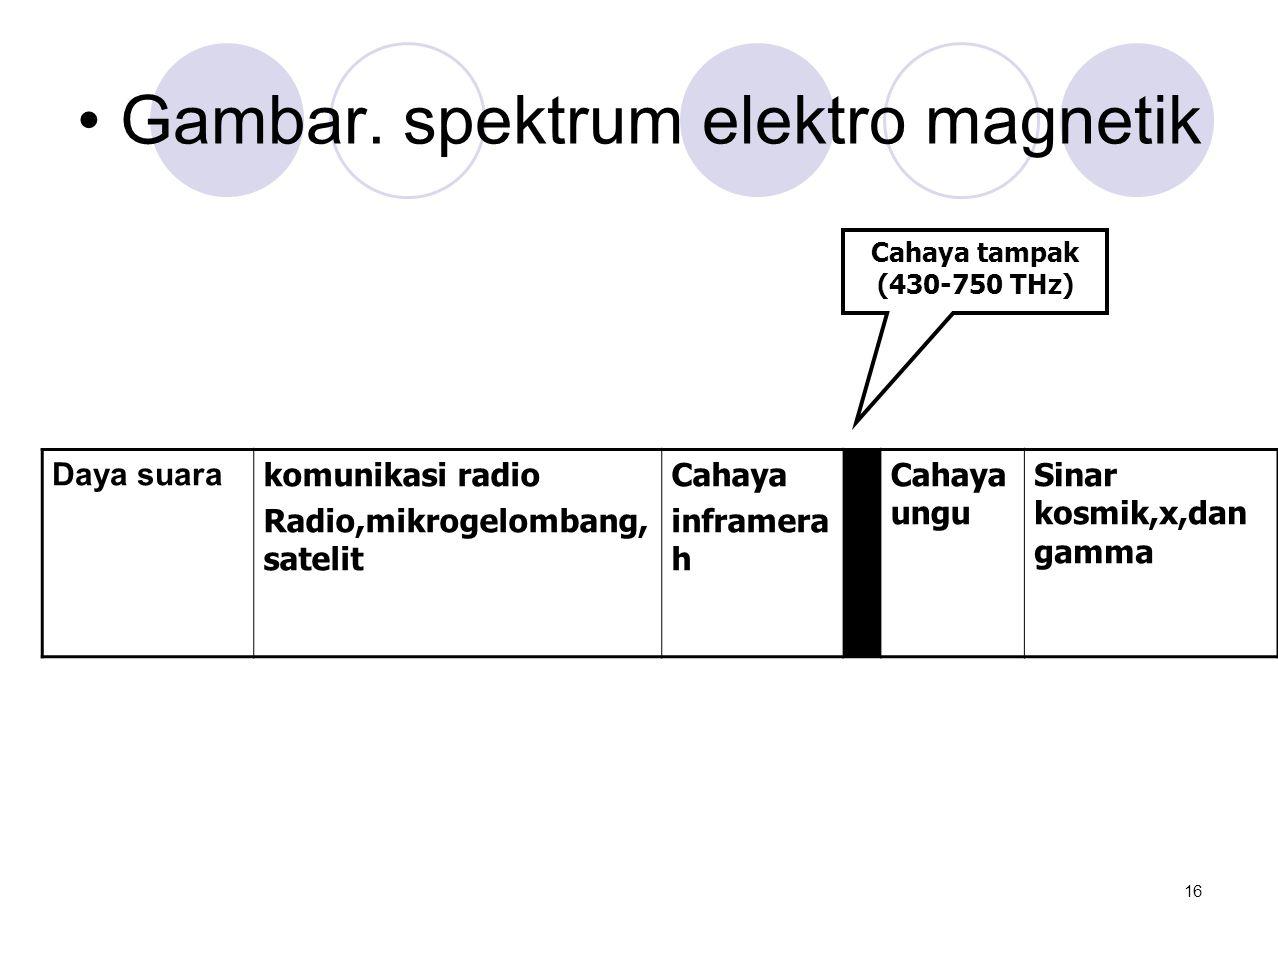 • Gambar. spektrum elektro magnetik Daya suara komunikasi radio Radio,mikrogelombang, satelit Cahaya inframera h Cahaya ungu Sinar kosmik,x,dan gamma